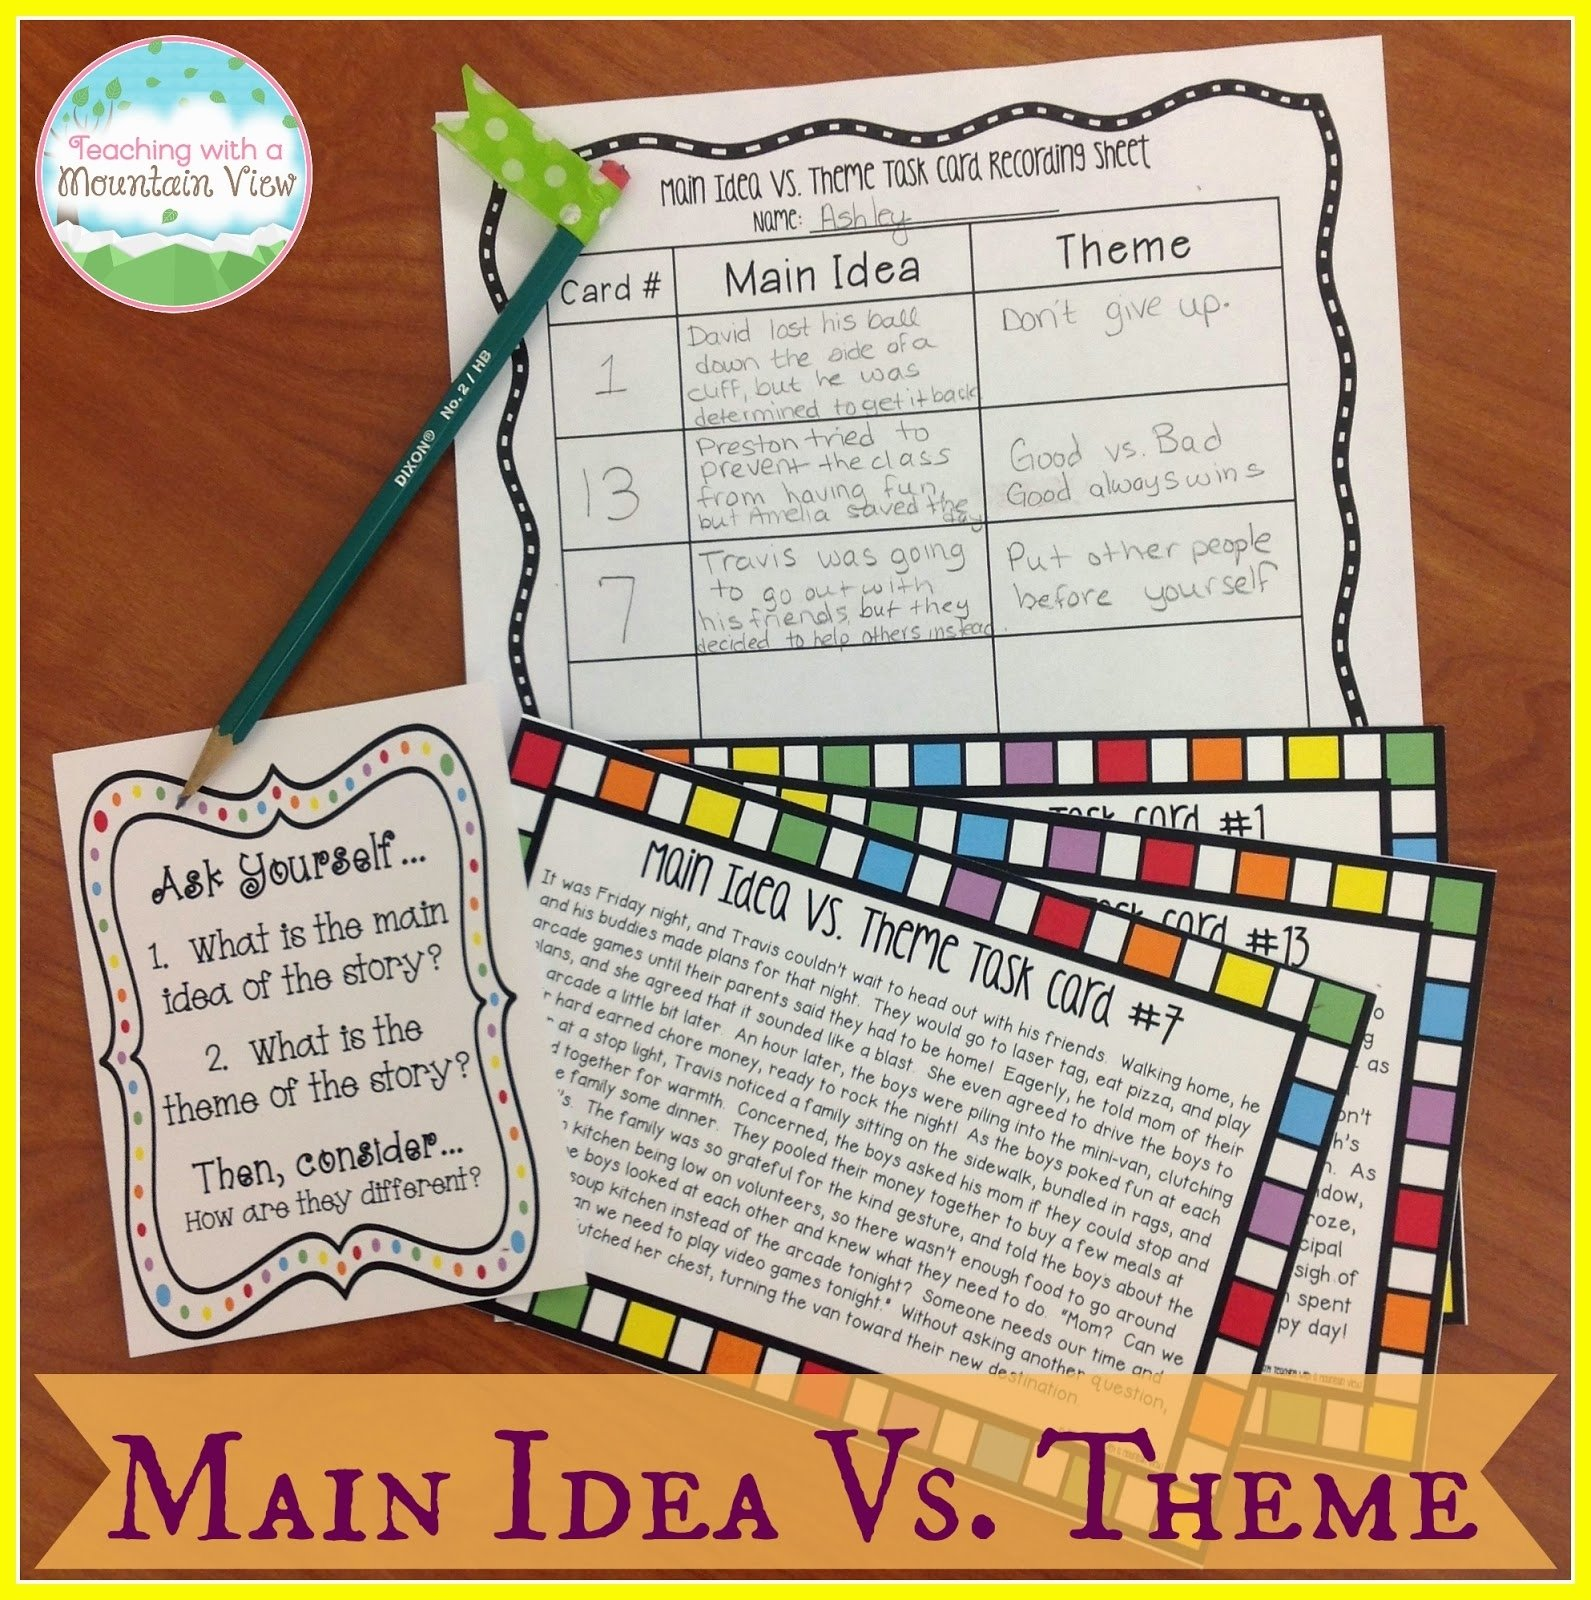 10 Pretty What Is Main Idea Of A Story teaching with a mountain view teaching main idea vs theme 2020